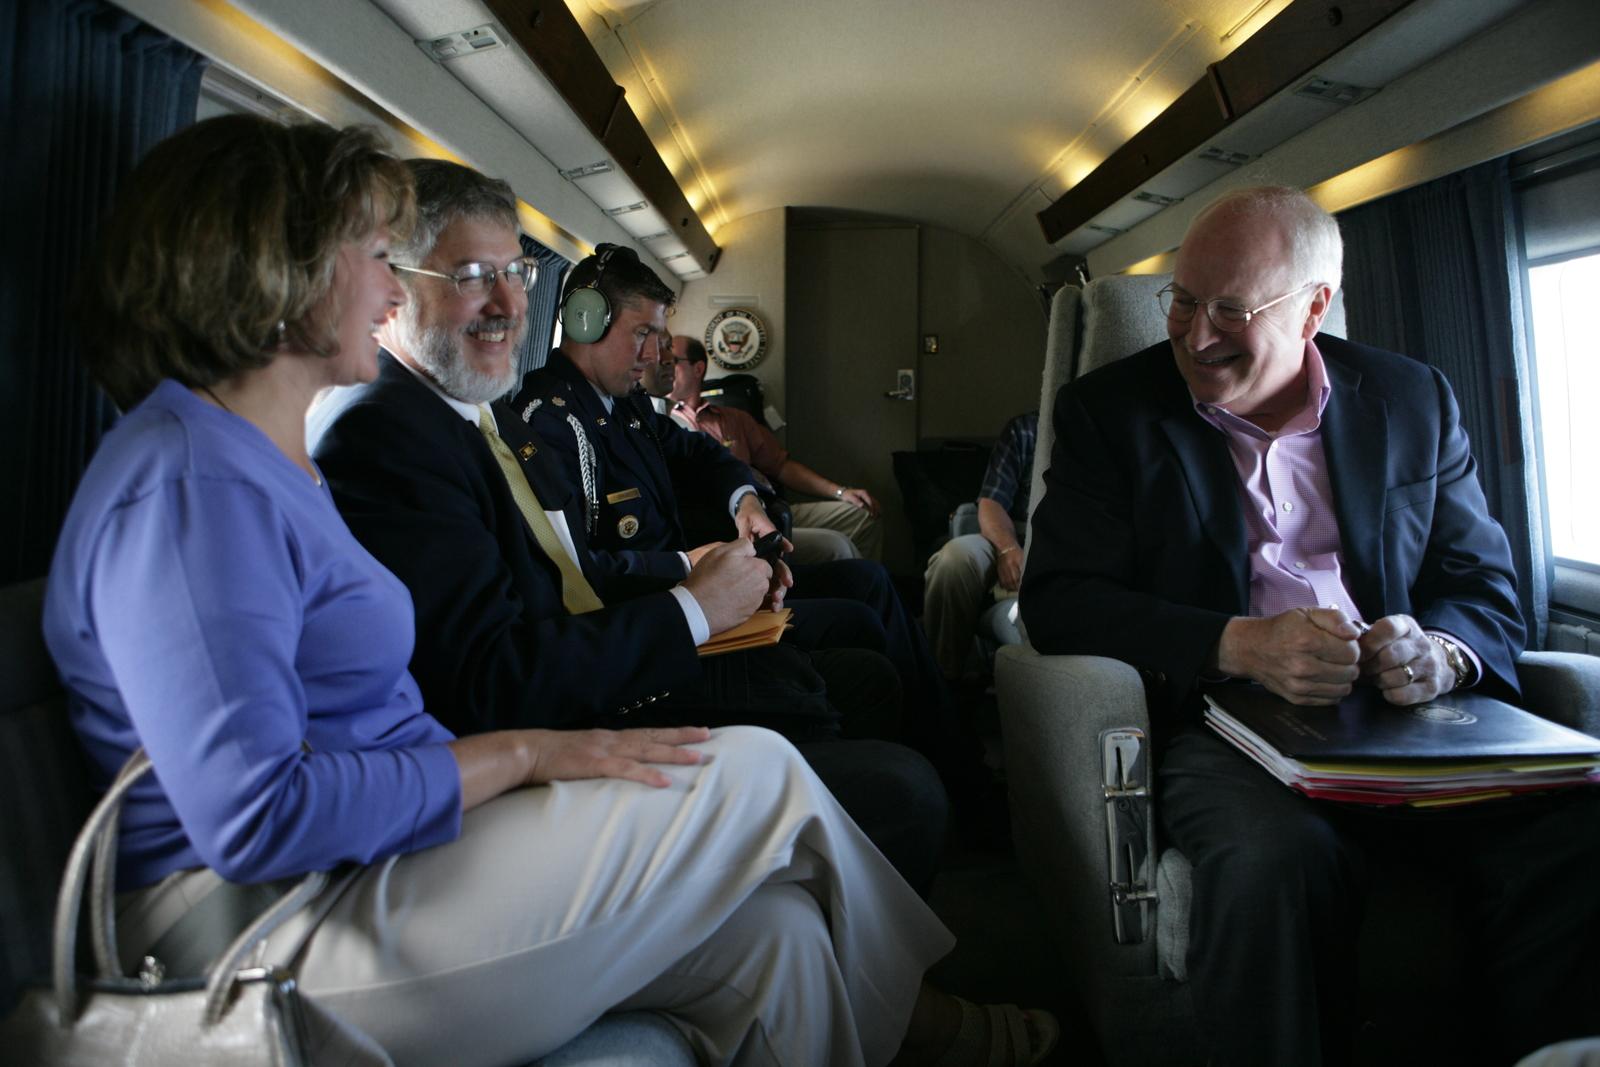 Vice President Cheney Talks with David and Cindy Addington Aboard Marine Two